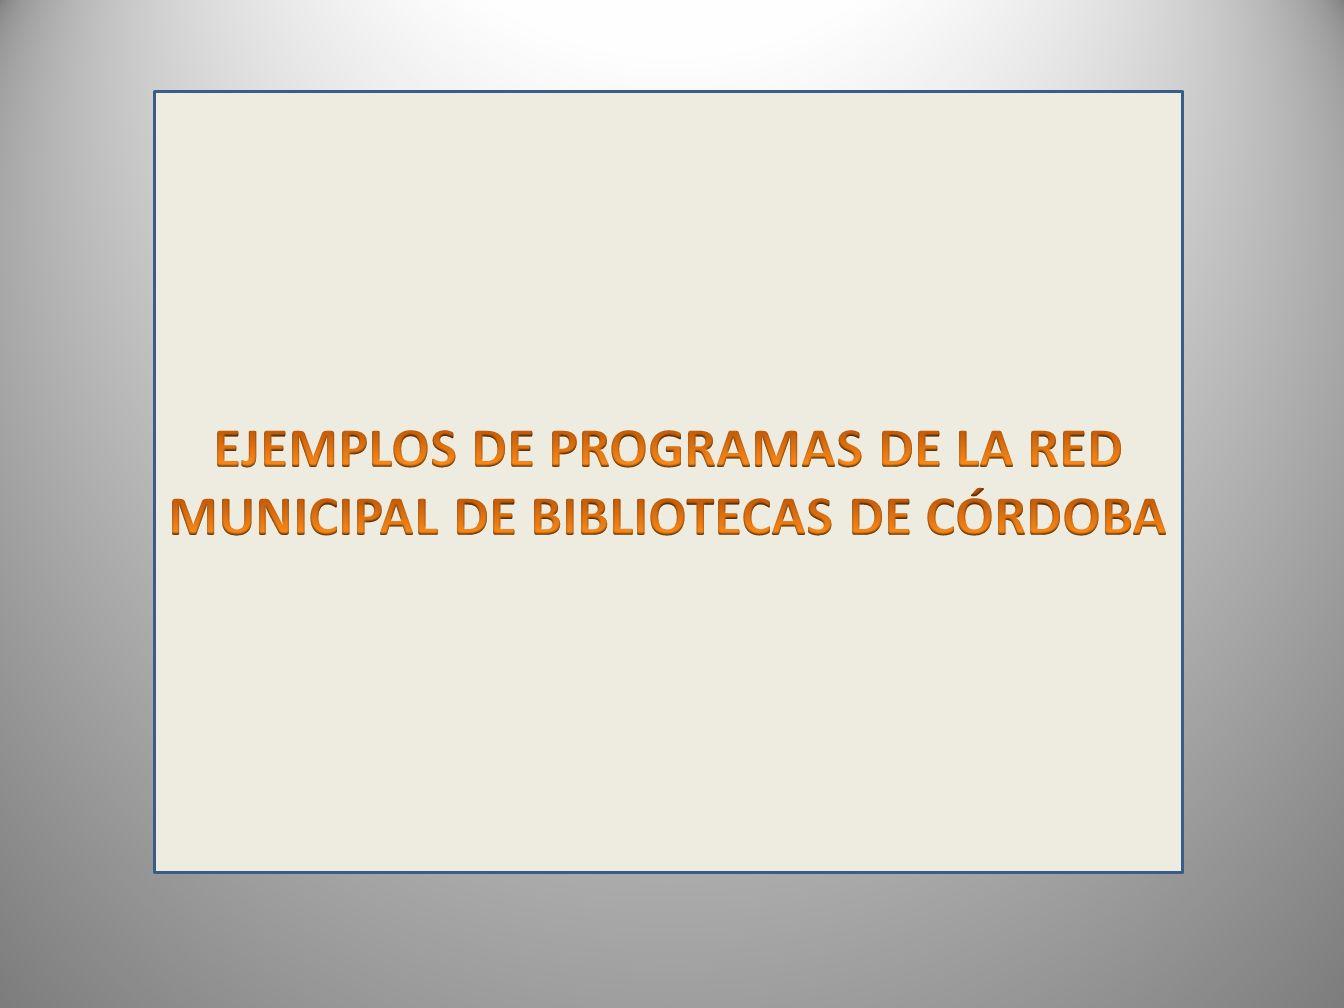 EJEMPLOS DE PROGRAMAS DE LA RED MUNICIPAL DE BIBLIOTECAS DE CÓRDOBA